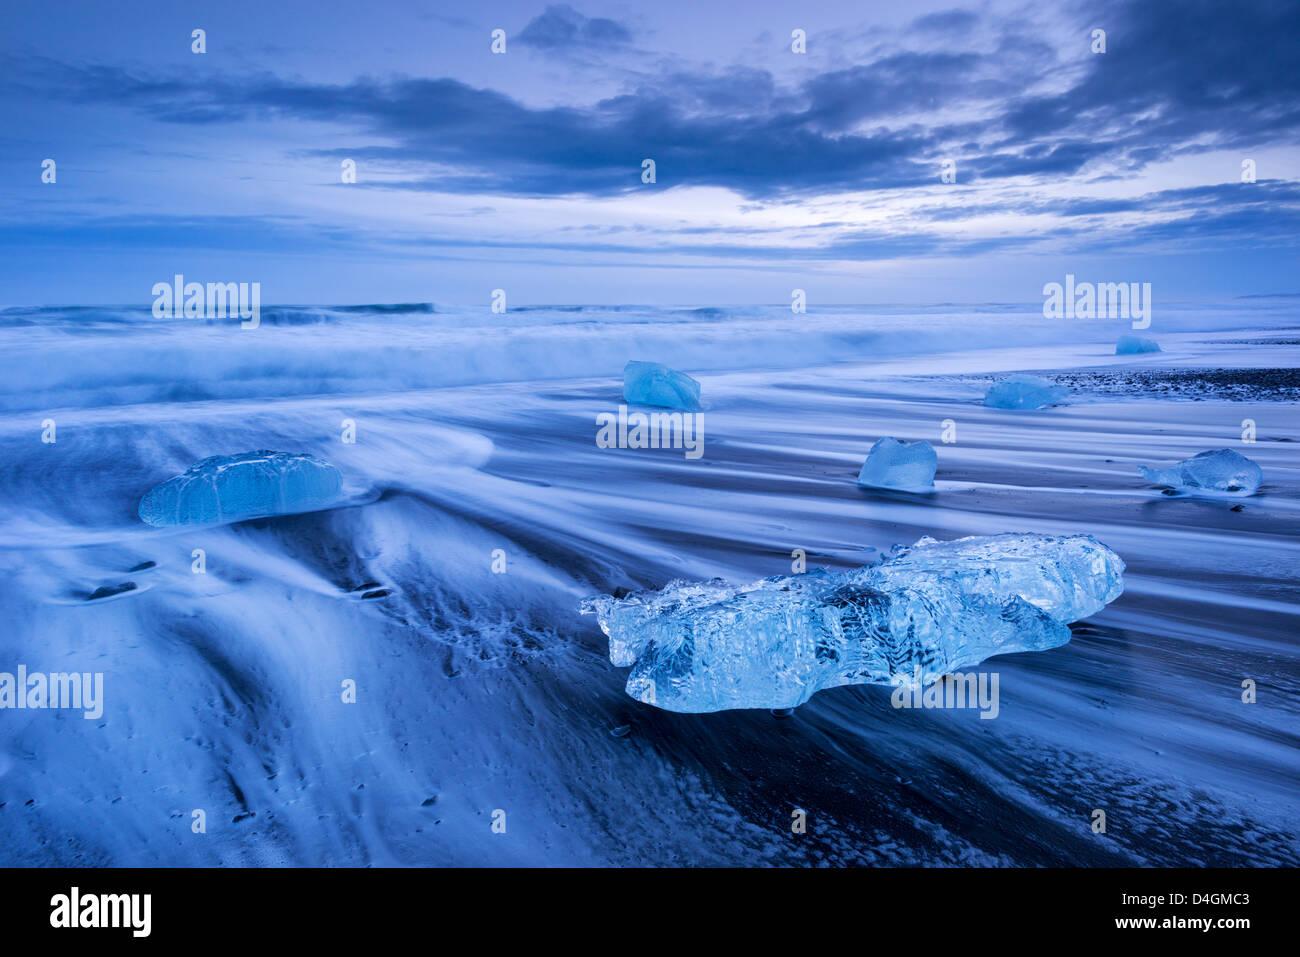 Eis und Wellen am Jökulsárlón Strand, Süd-Island. Winter (Januar) 2013. Stockbild